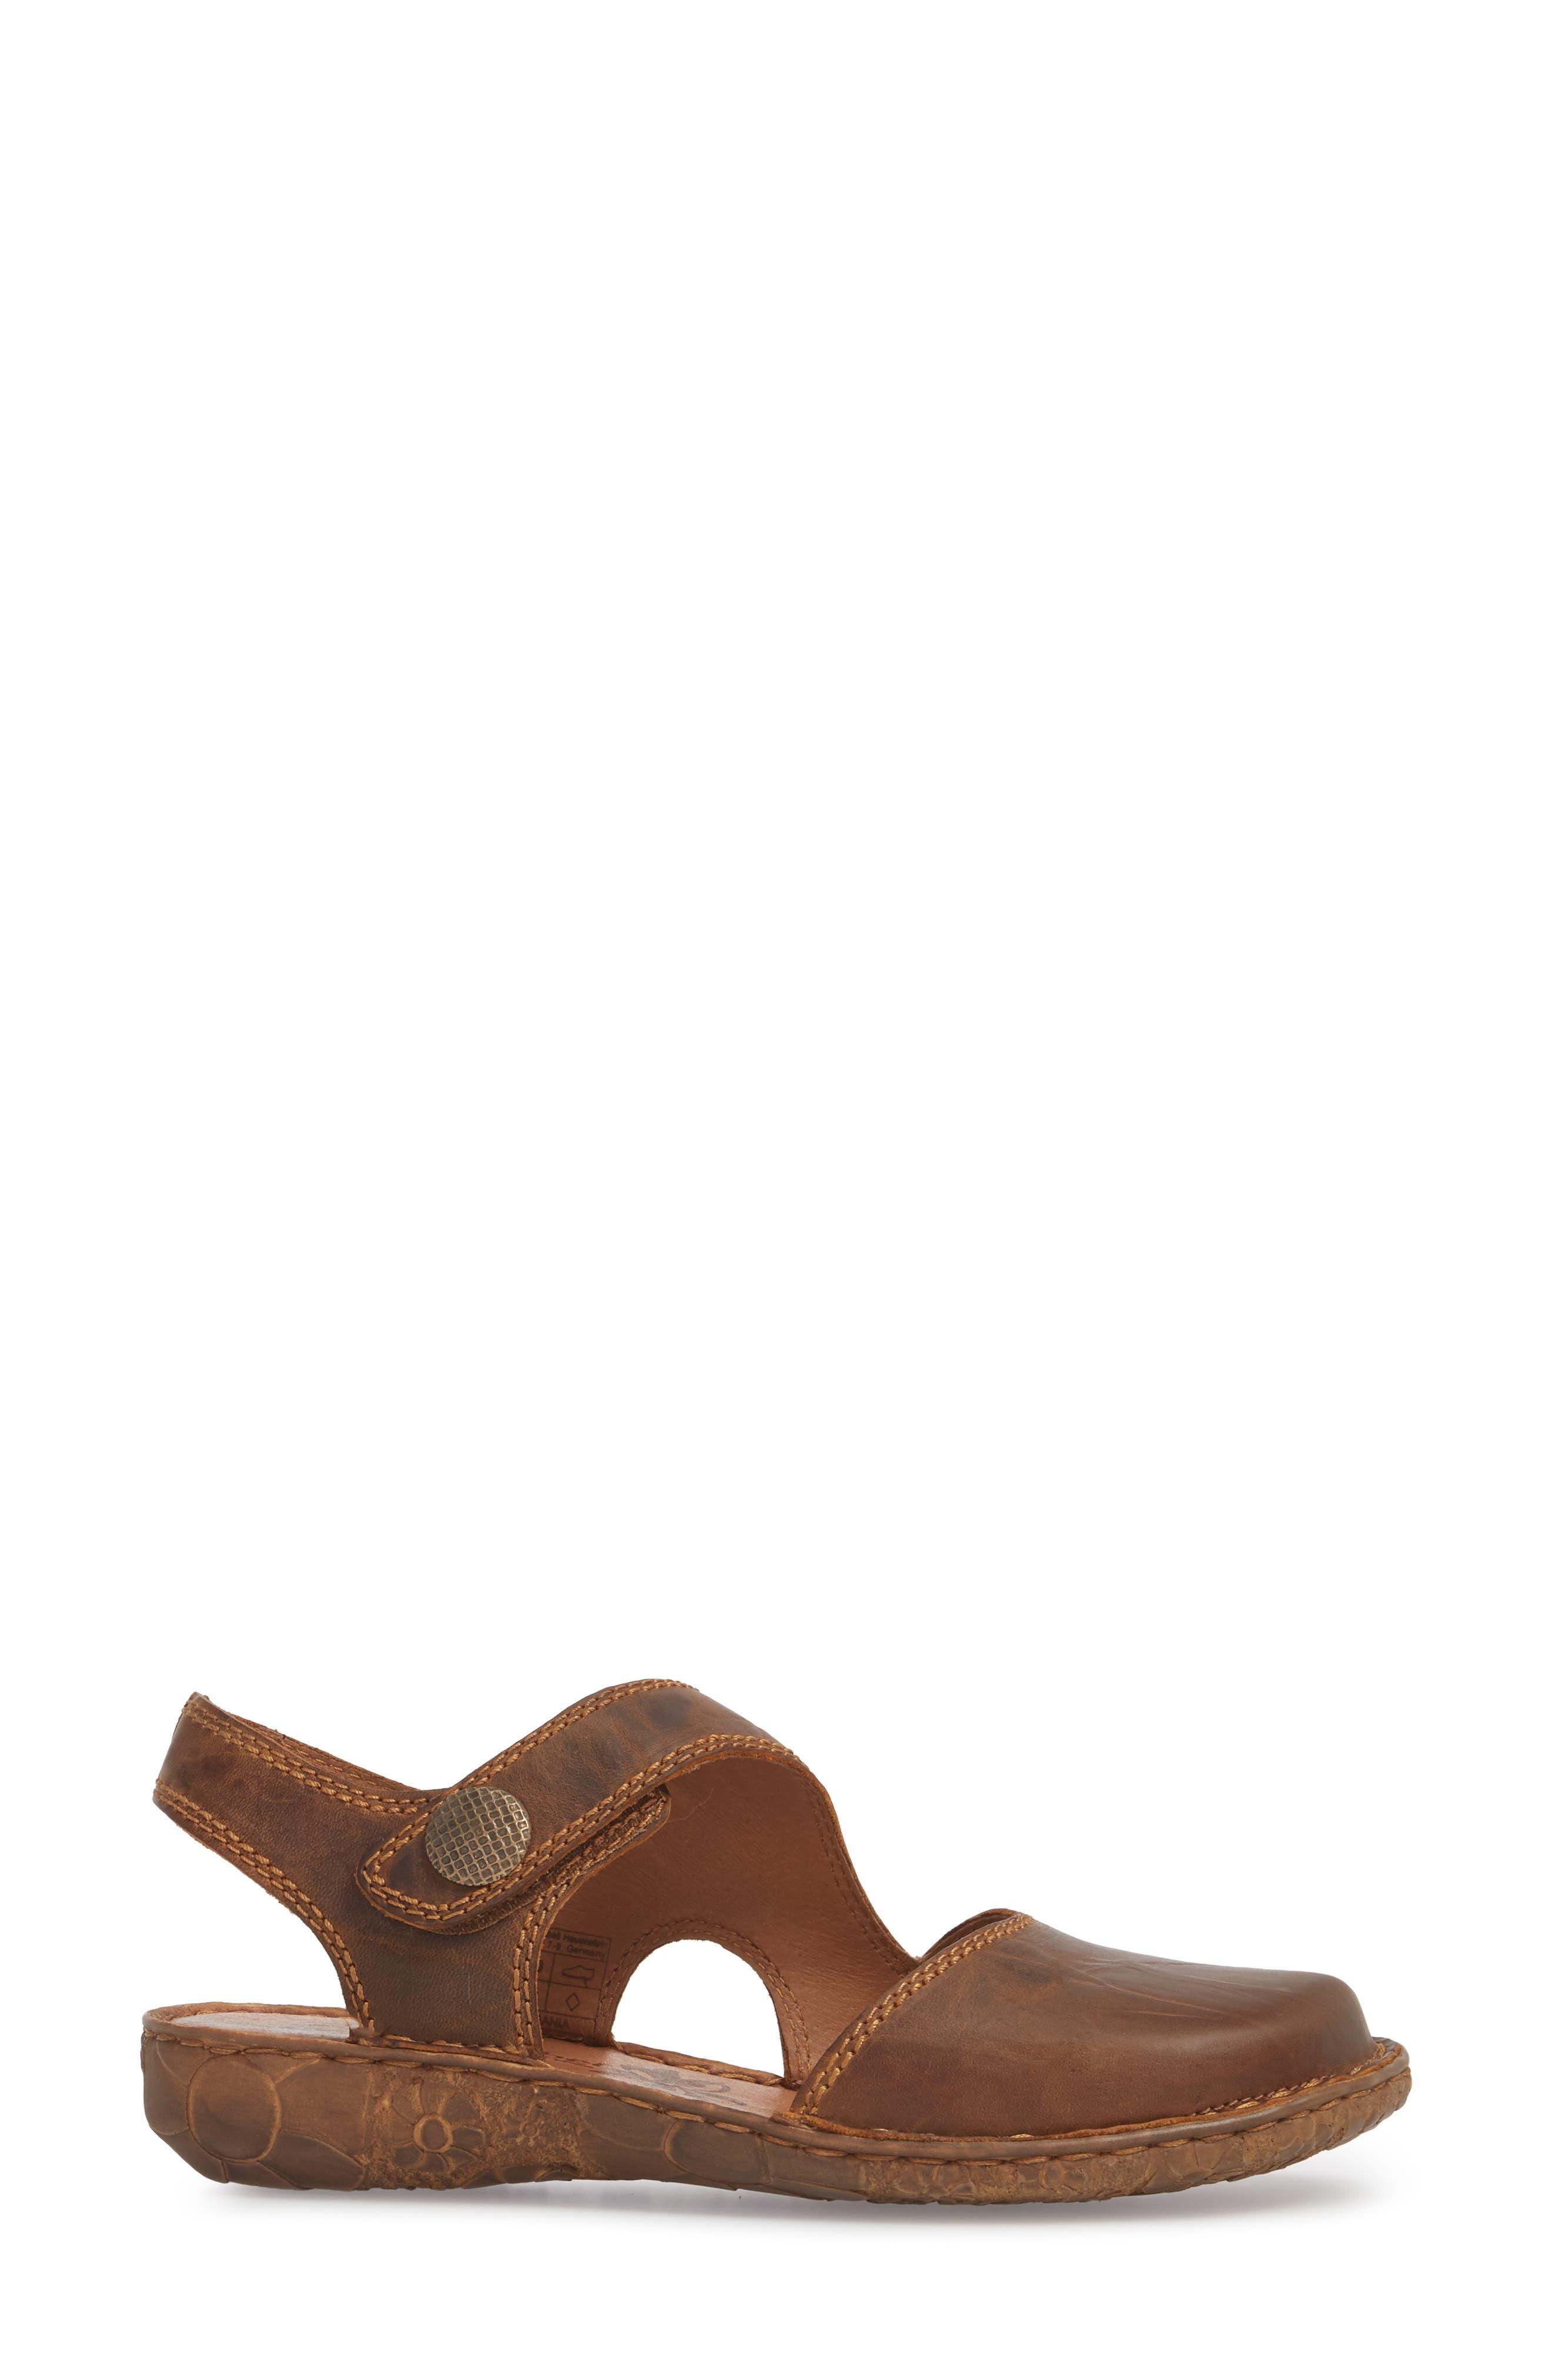 Rosalie 27 Sandal,                             Alternate thumbnail 3, color,                             Brandy Leather